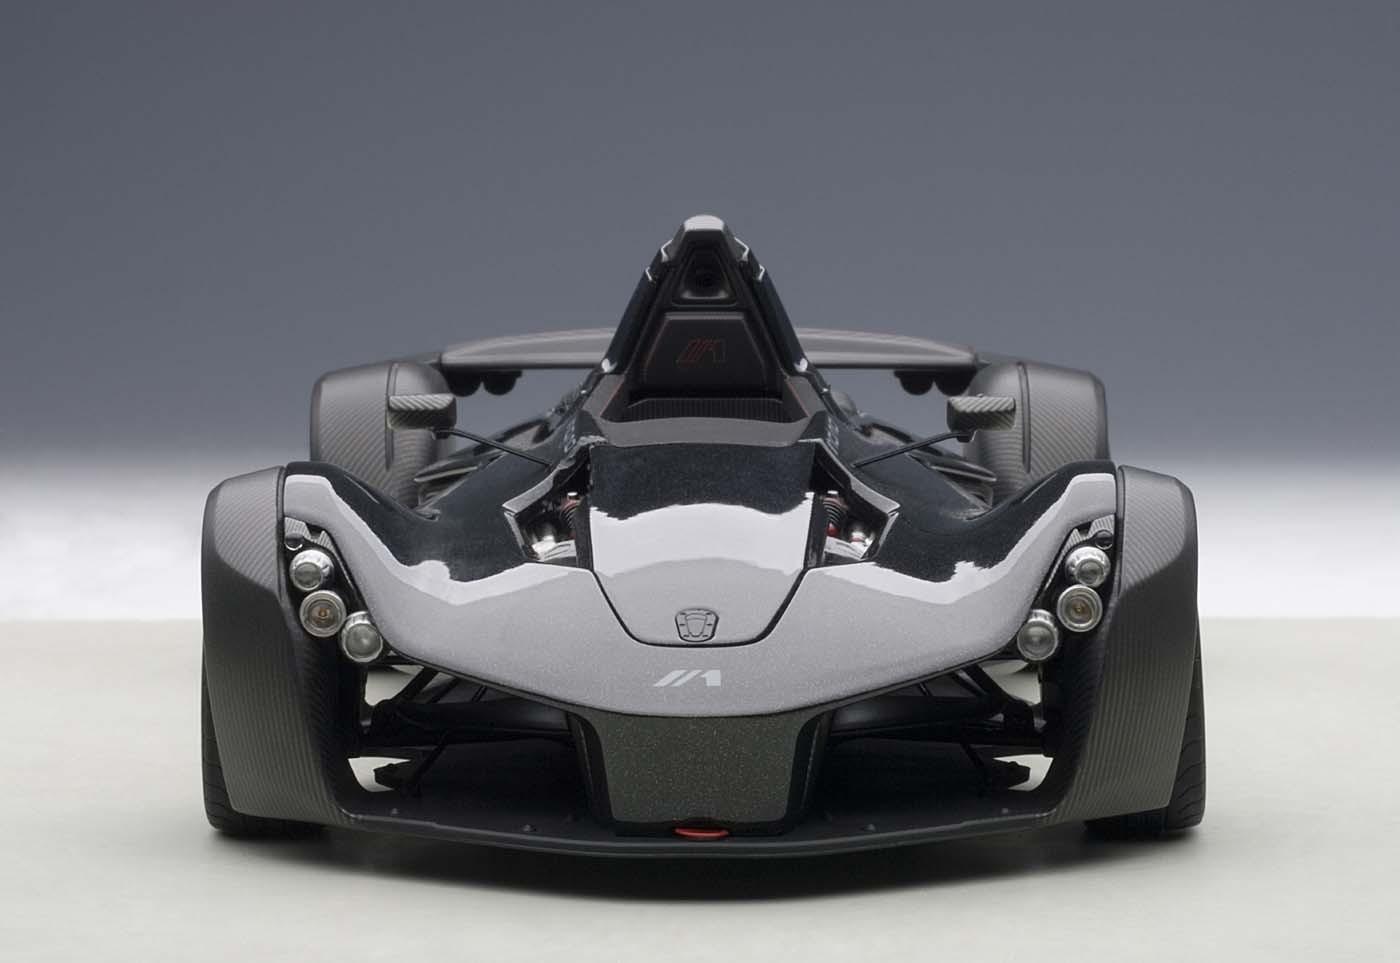 Bac Mono For Sale >> AUTOart Highly detailed die-cast model BAC Mono Metallic Black by Briggs Automotive Company ...